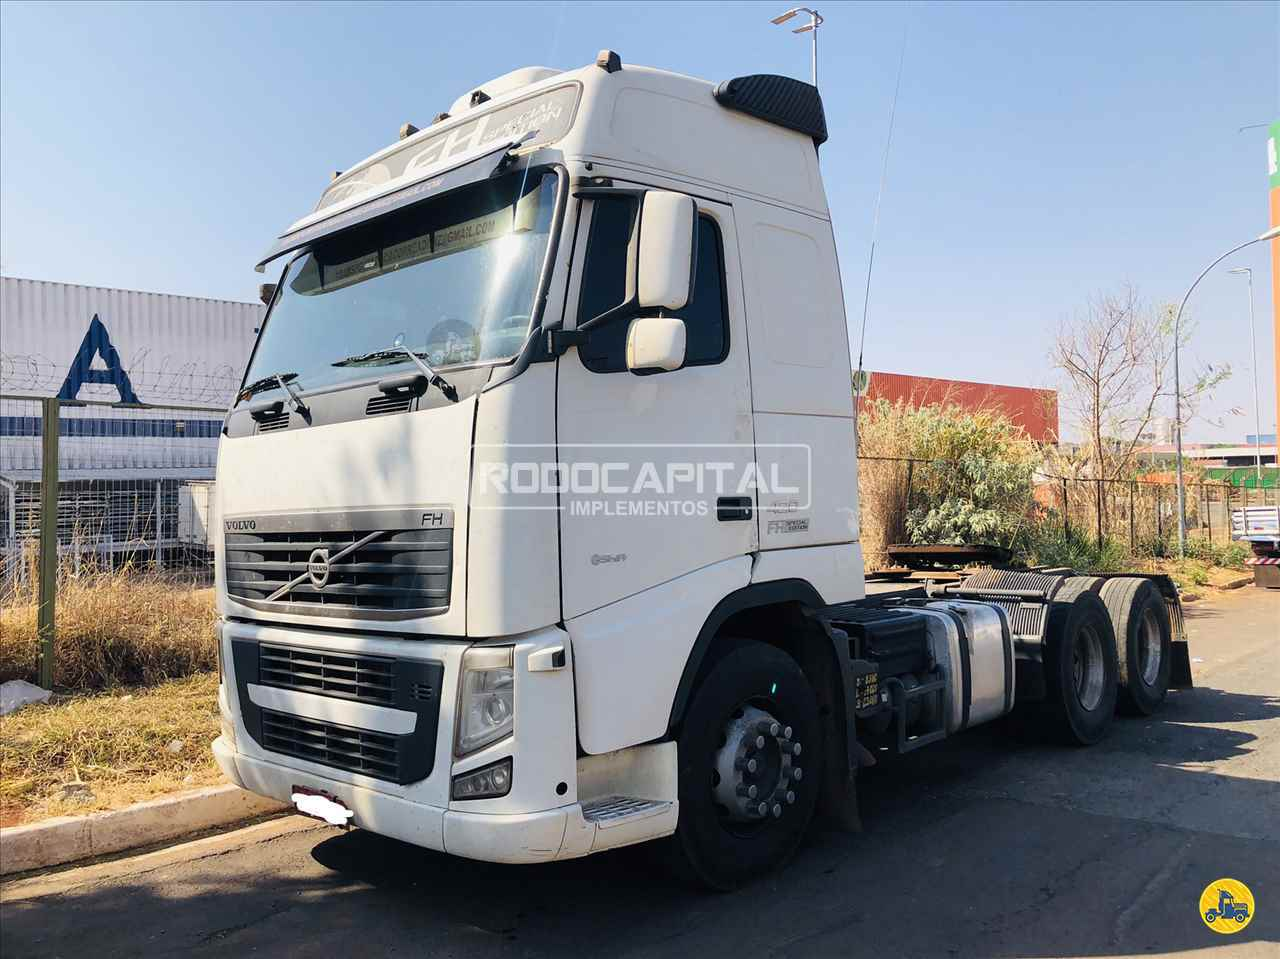 CAMINHAO VOLVO VOLVO FH 420 Cavalo Mecânico Truck 6x2 RODOCAPITAL - TRUCKVAN BRASILIA DISTRITO FEDERAL DF